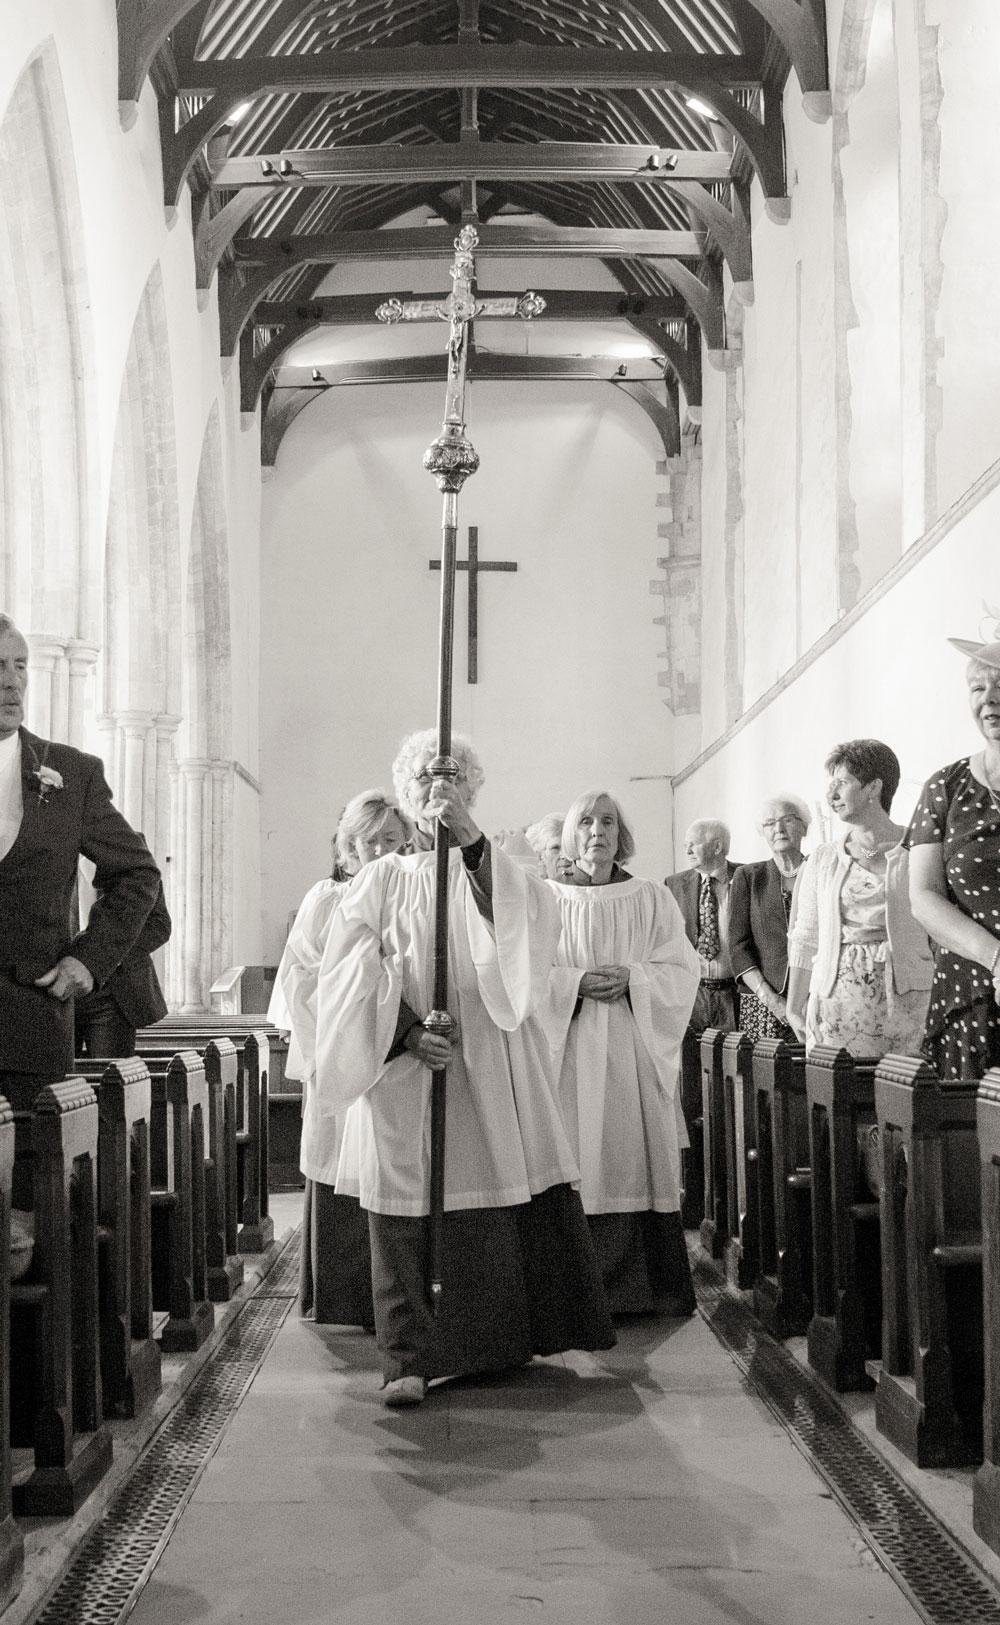 Dorchester Abbey choir